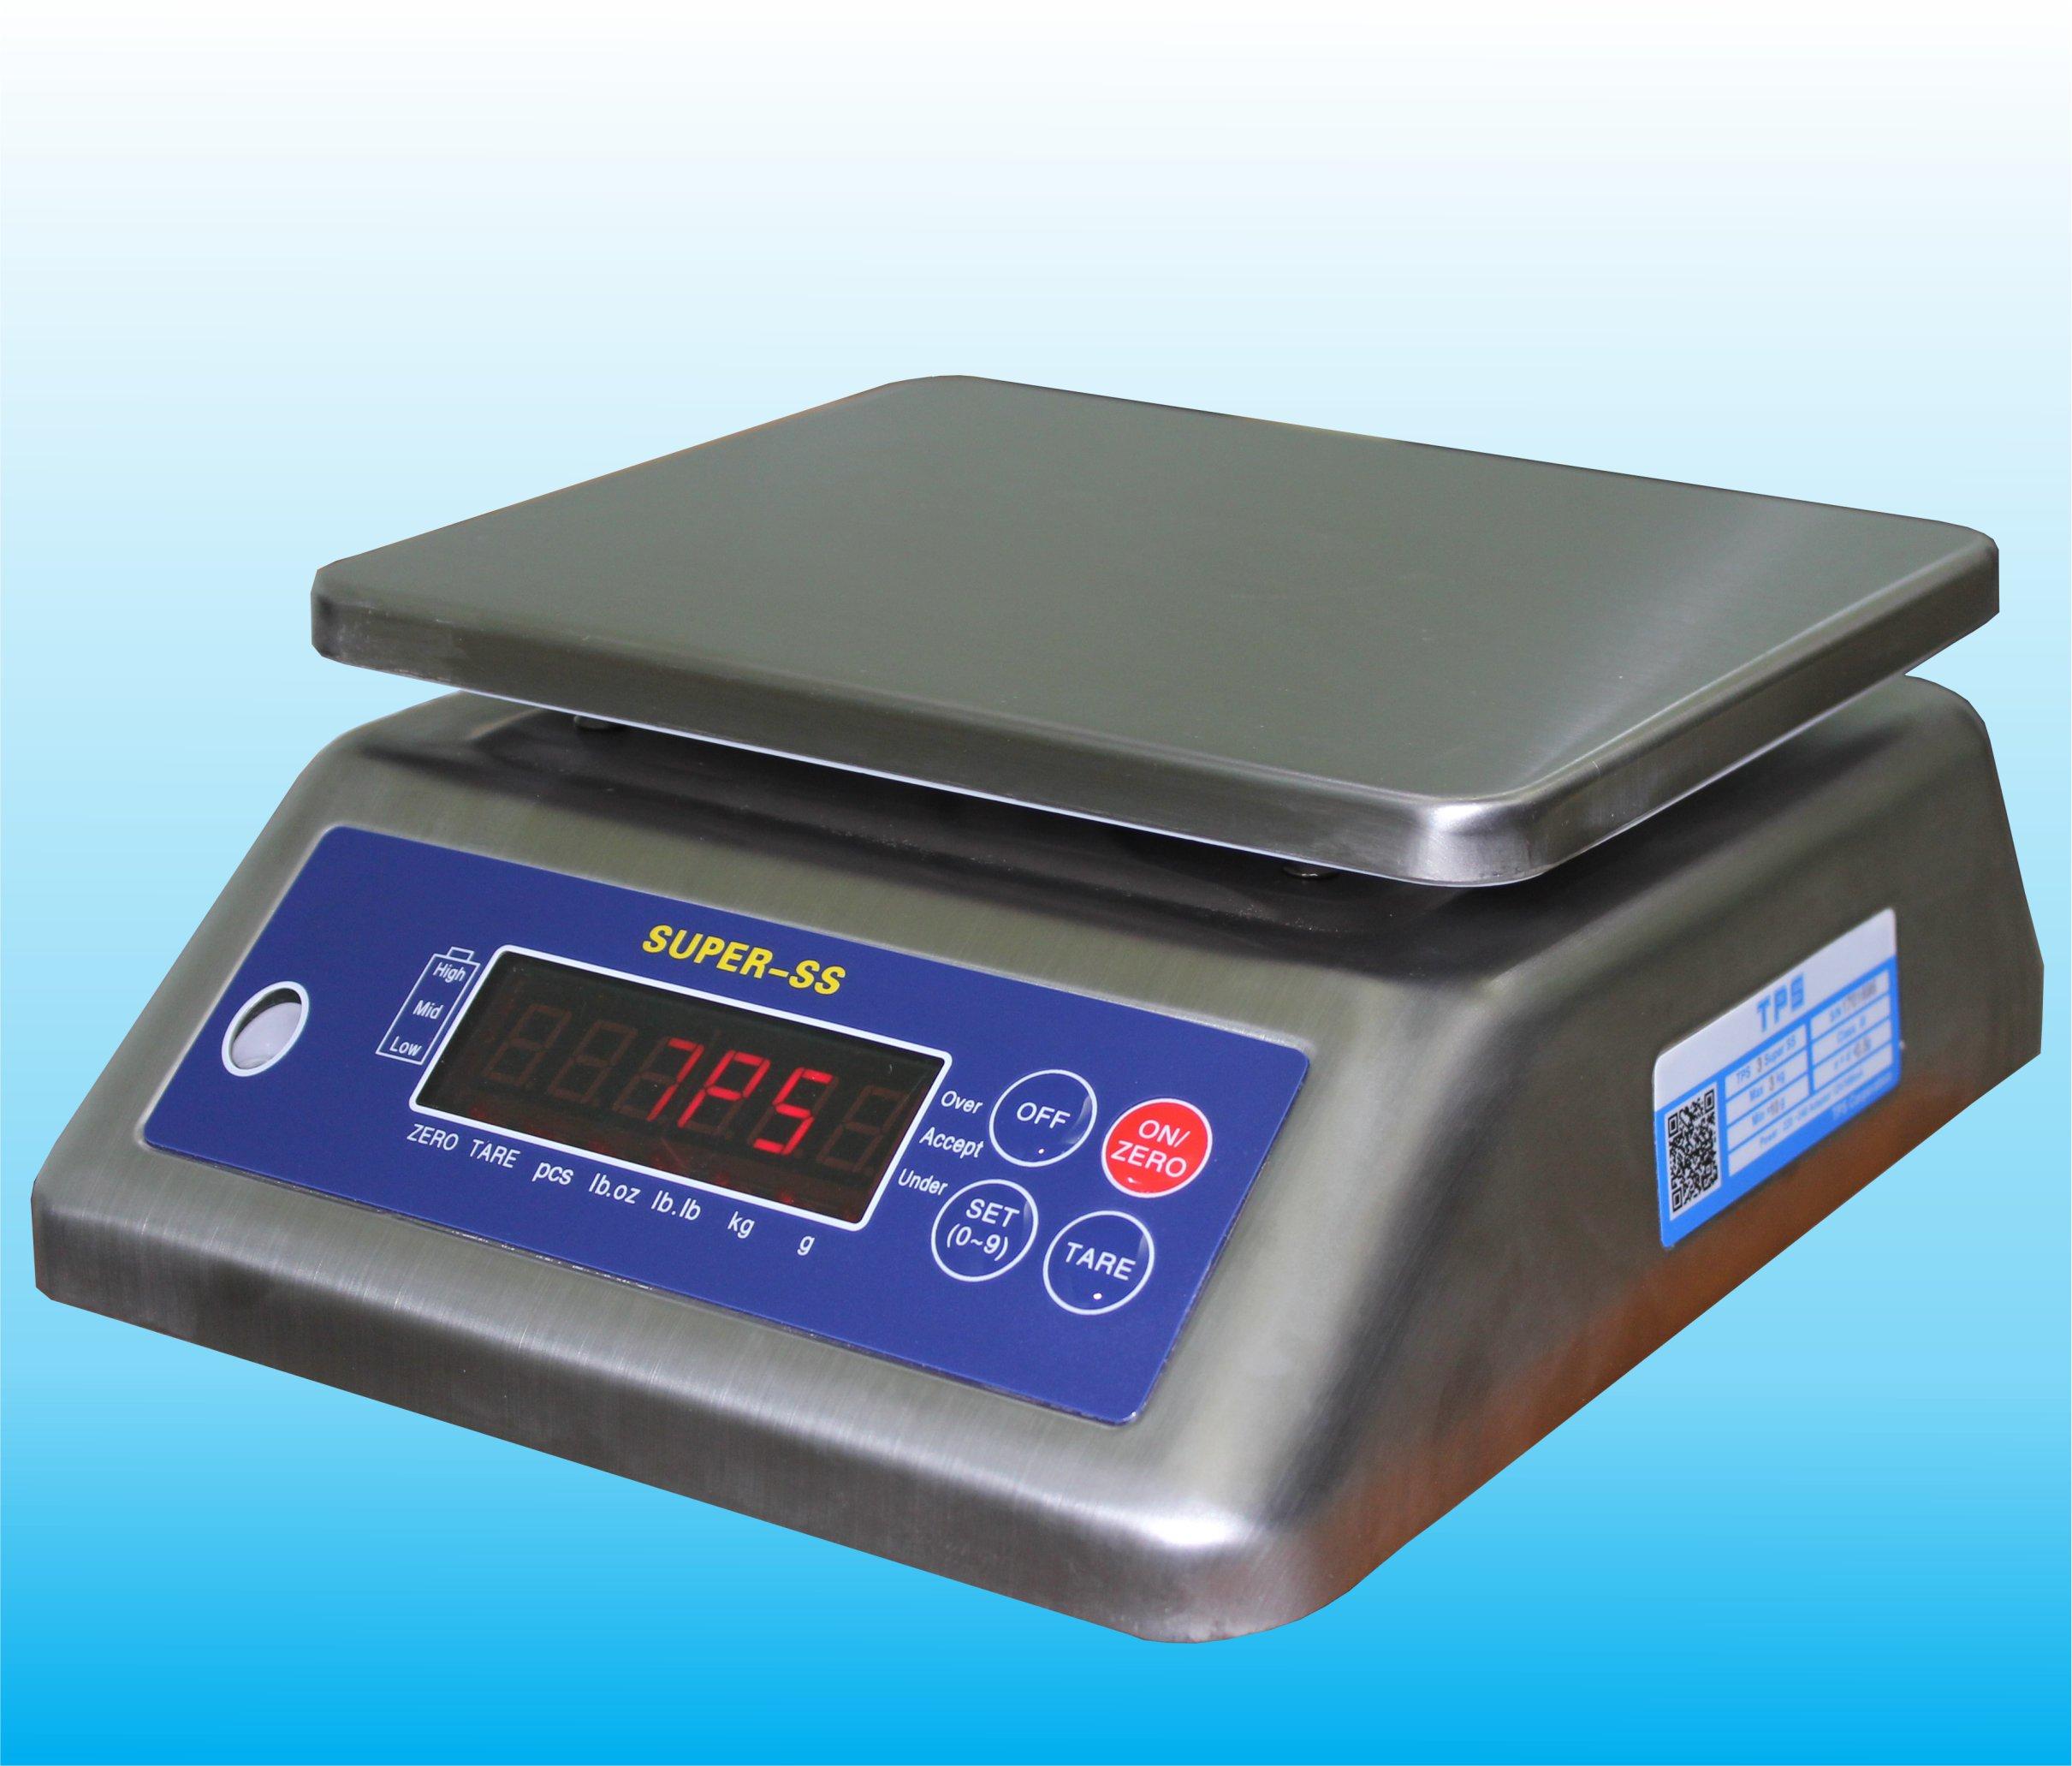 TPS1.5 SuperSS-1,5kg/0.2g - 930